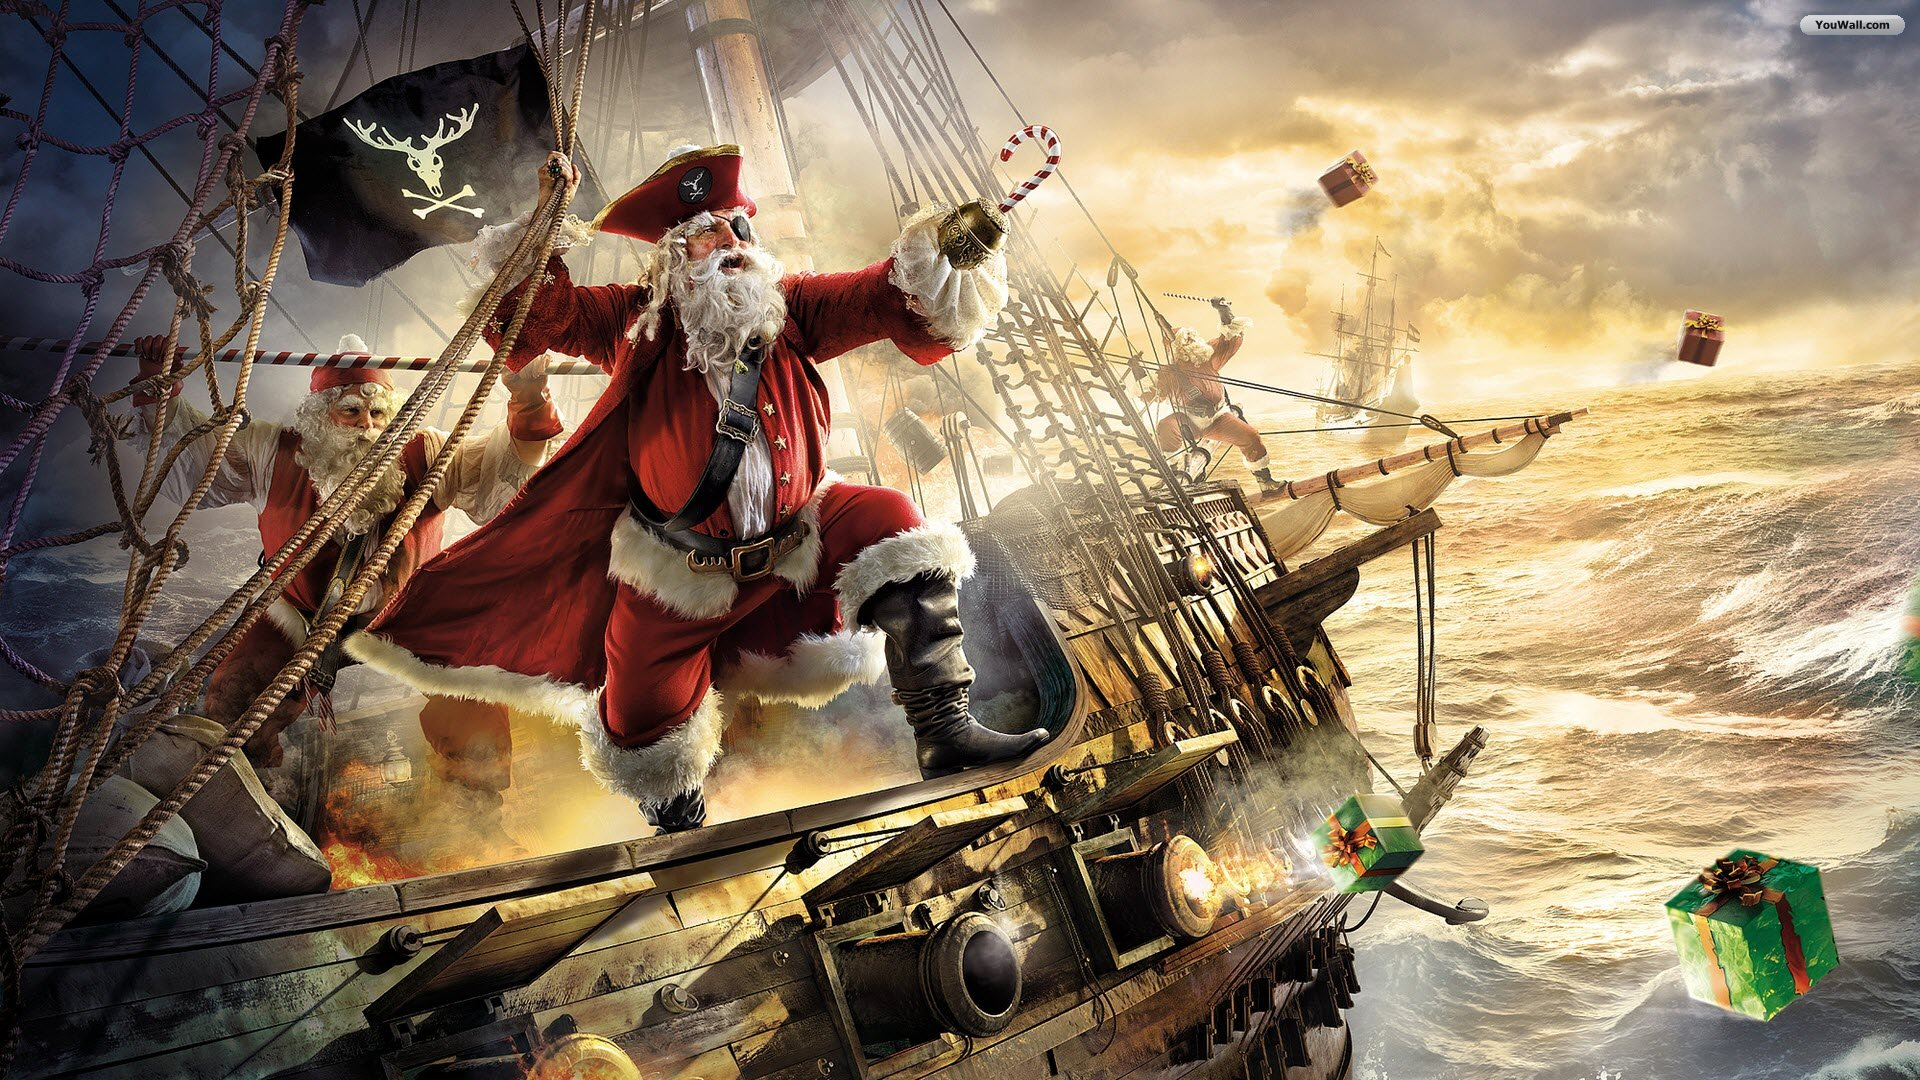 as desktop wallpaper santa claus pirate wallpaper 1920x1080 612 kb